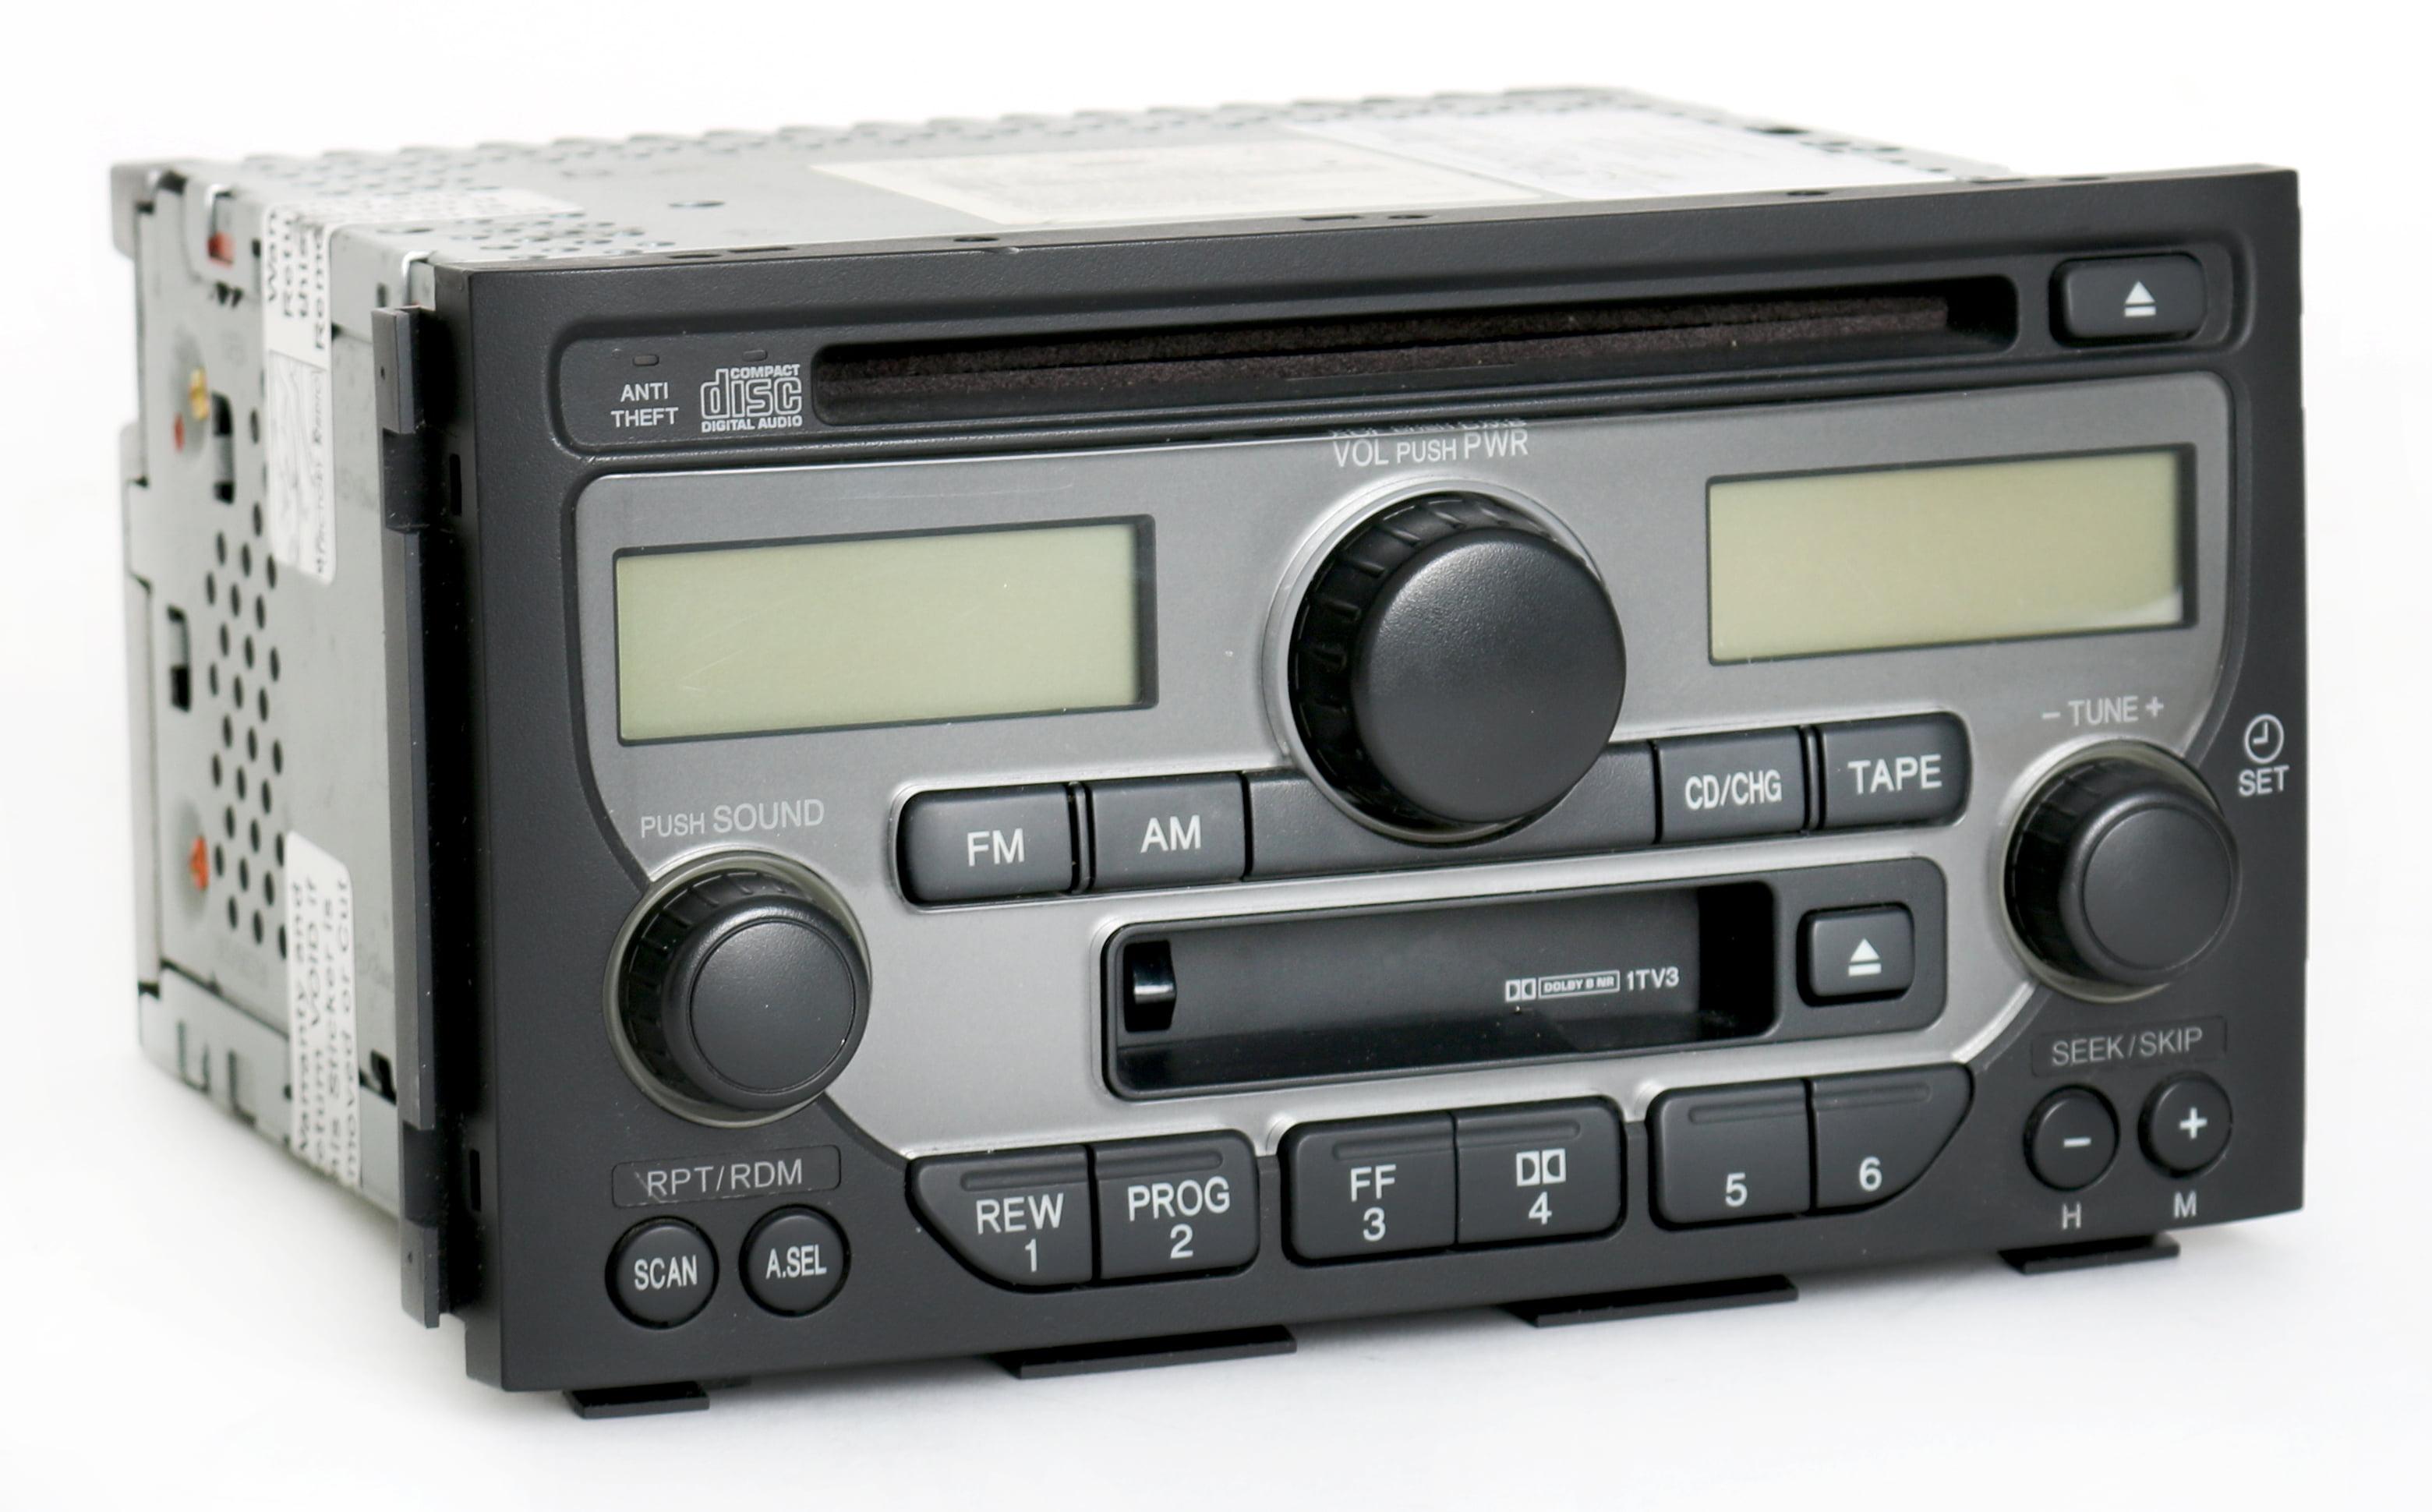 Honda Pilot 2003-2005 Radio AM FM CD Cassette Player 39100-S9V-A120 Face 1TV3 Refurbished by Honda